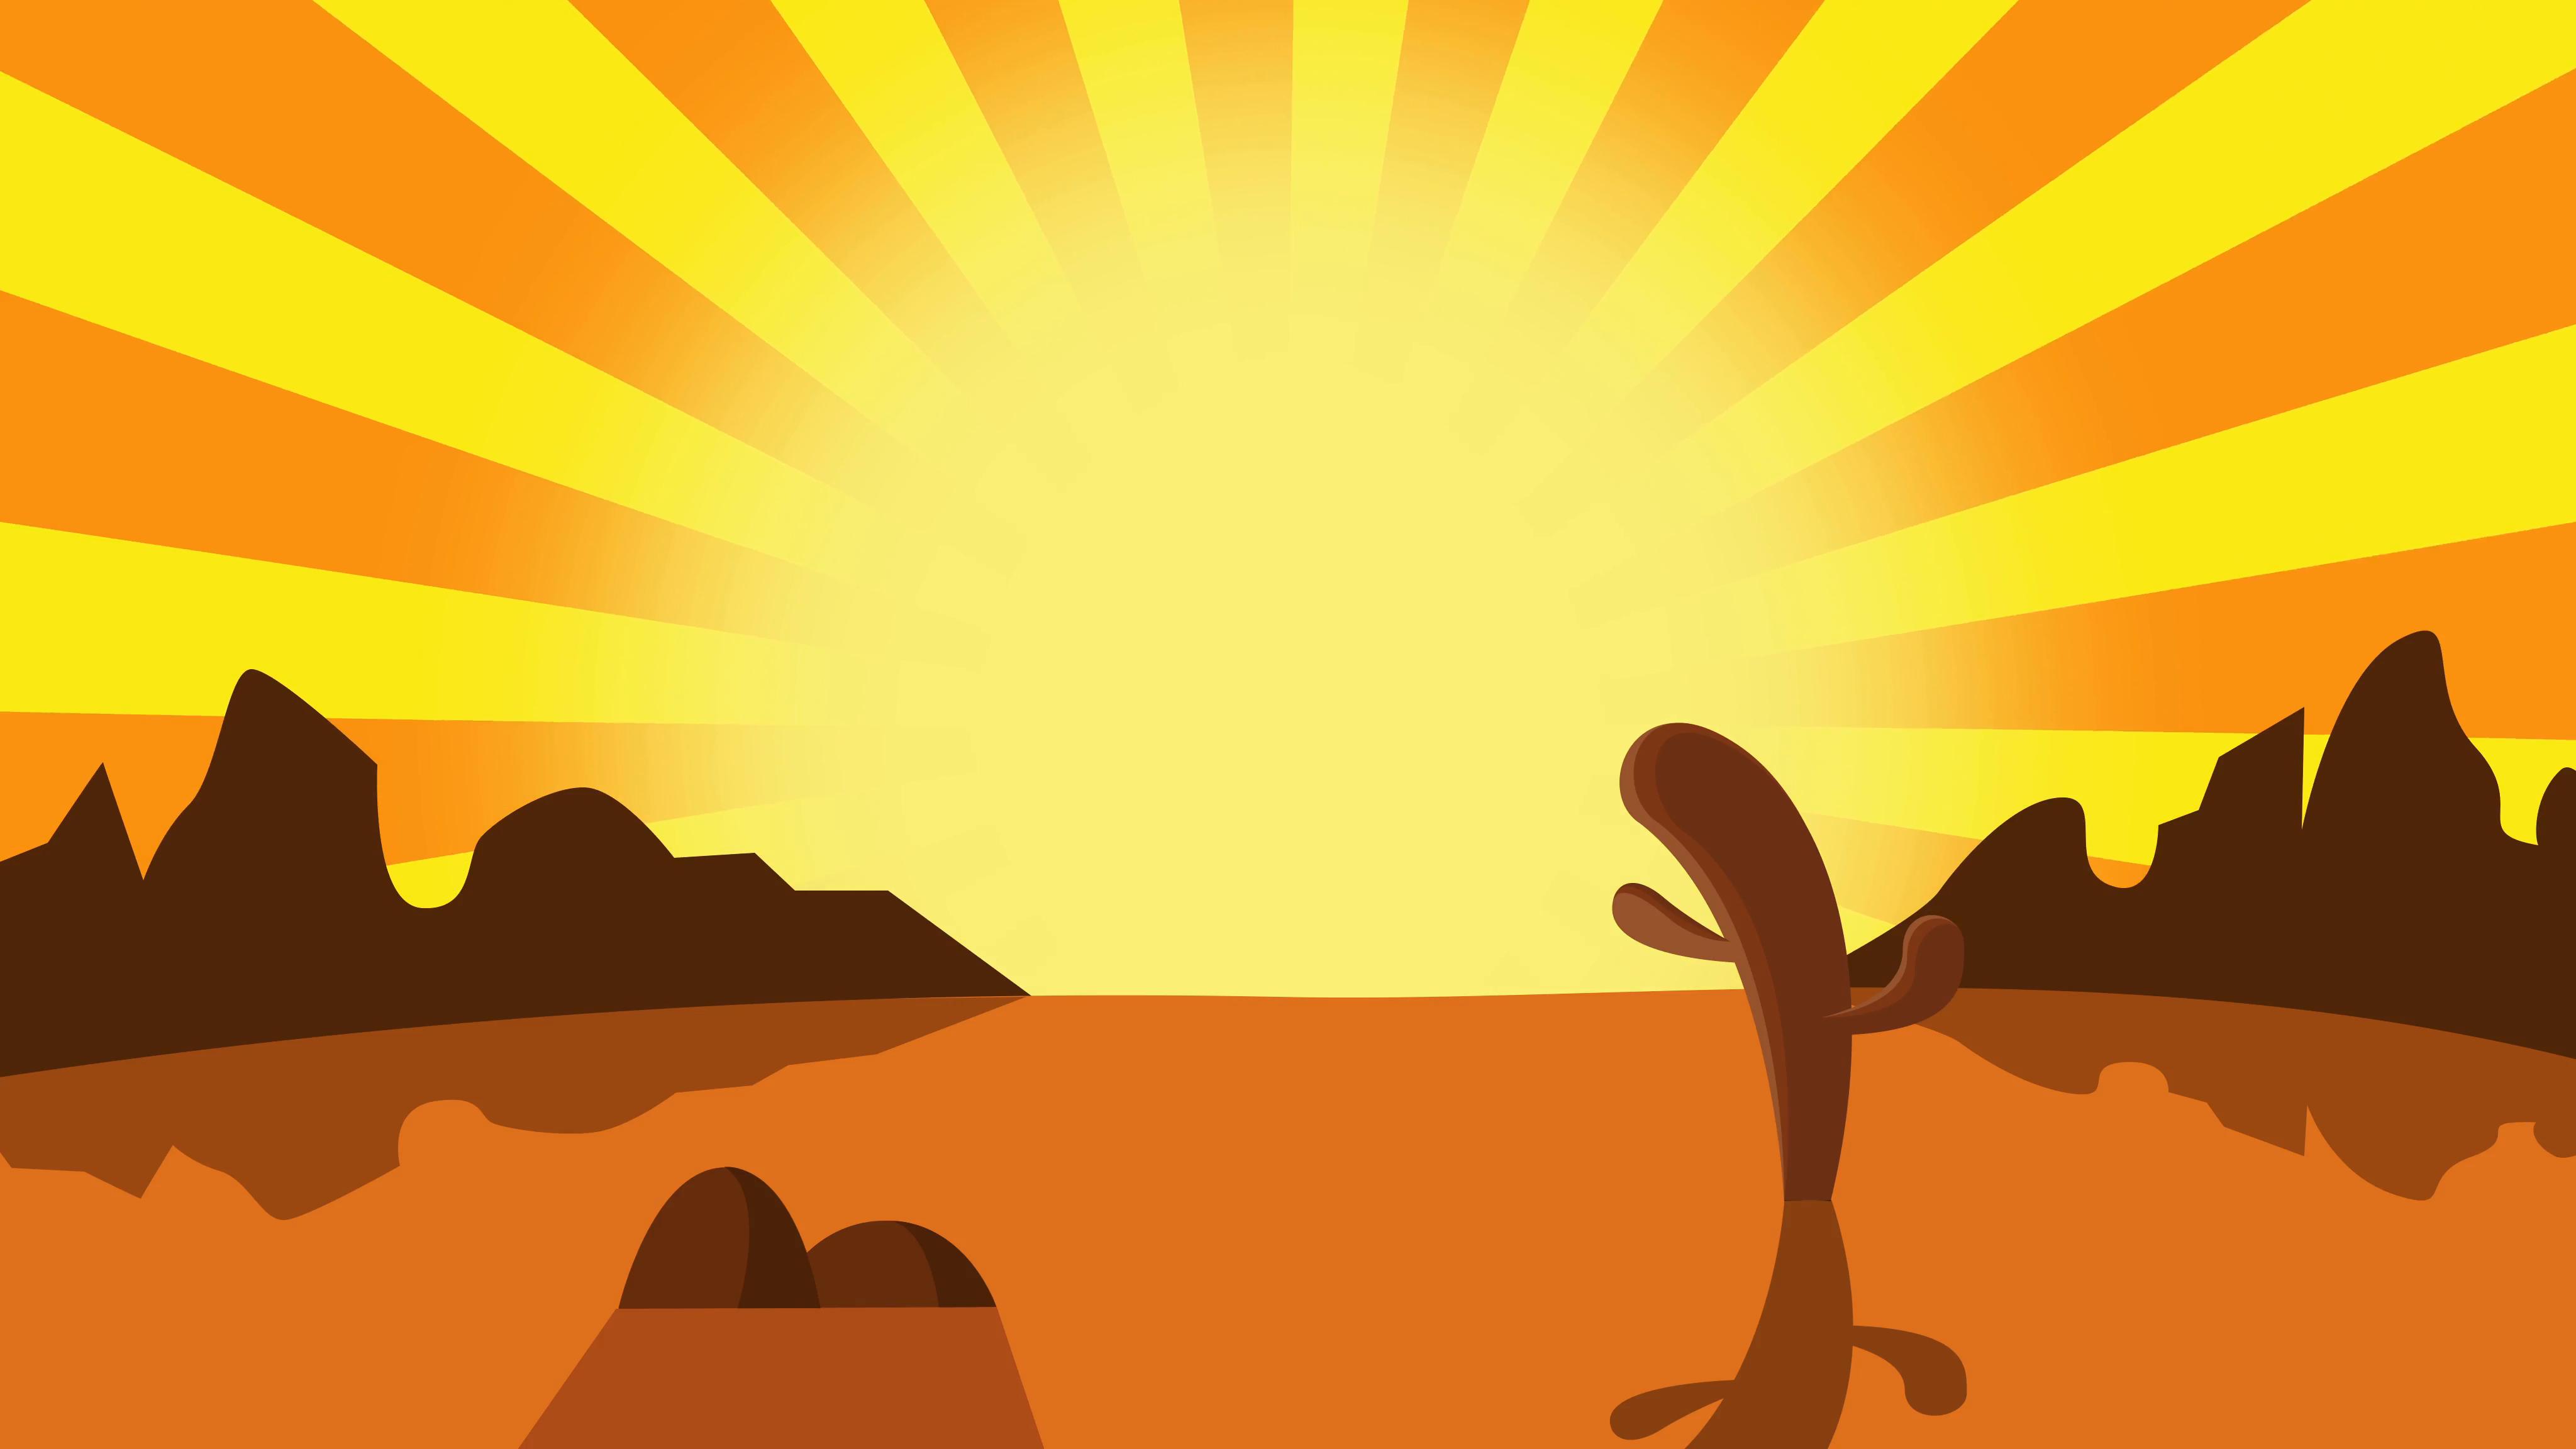 4096x2304 Cartoon Mexican Desert Background, Cactus Plants In Desert Sunset